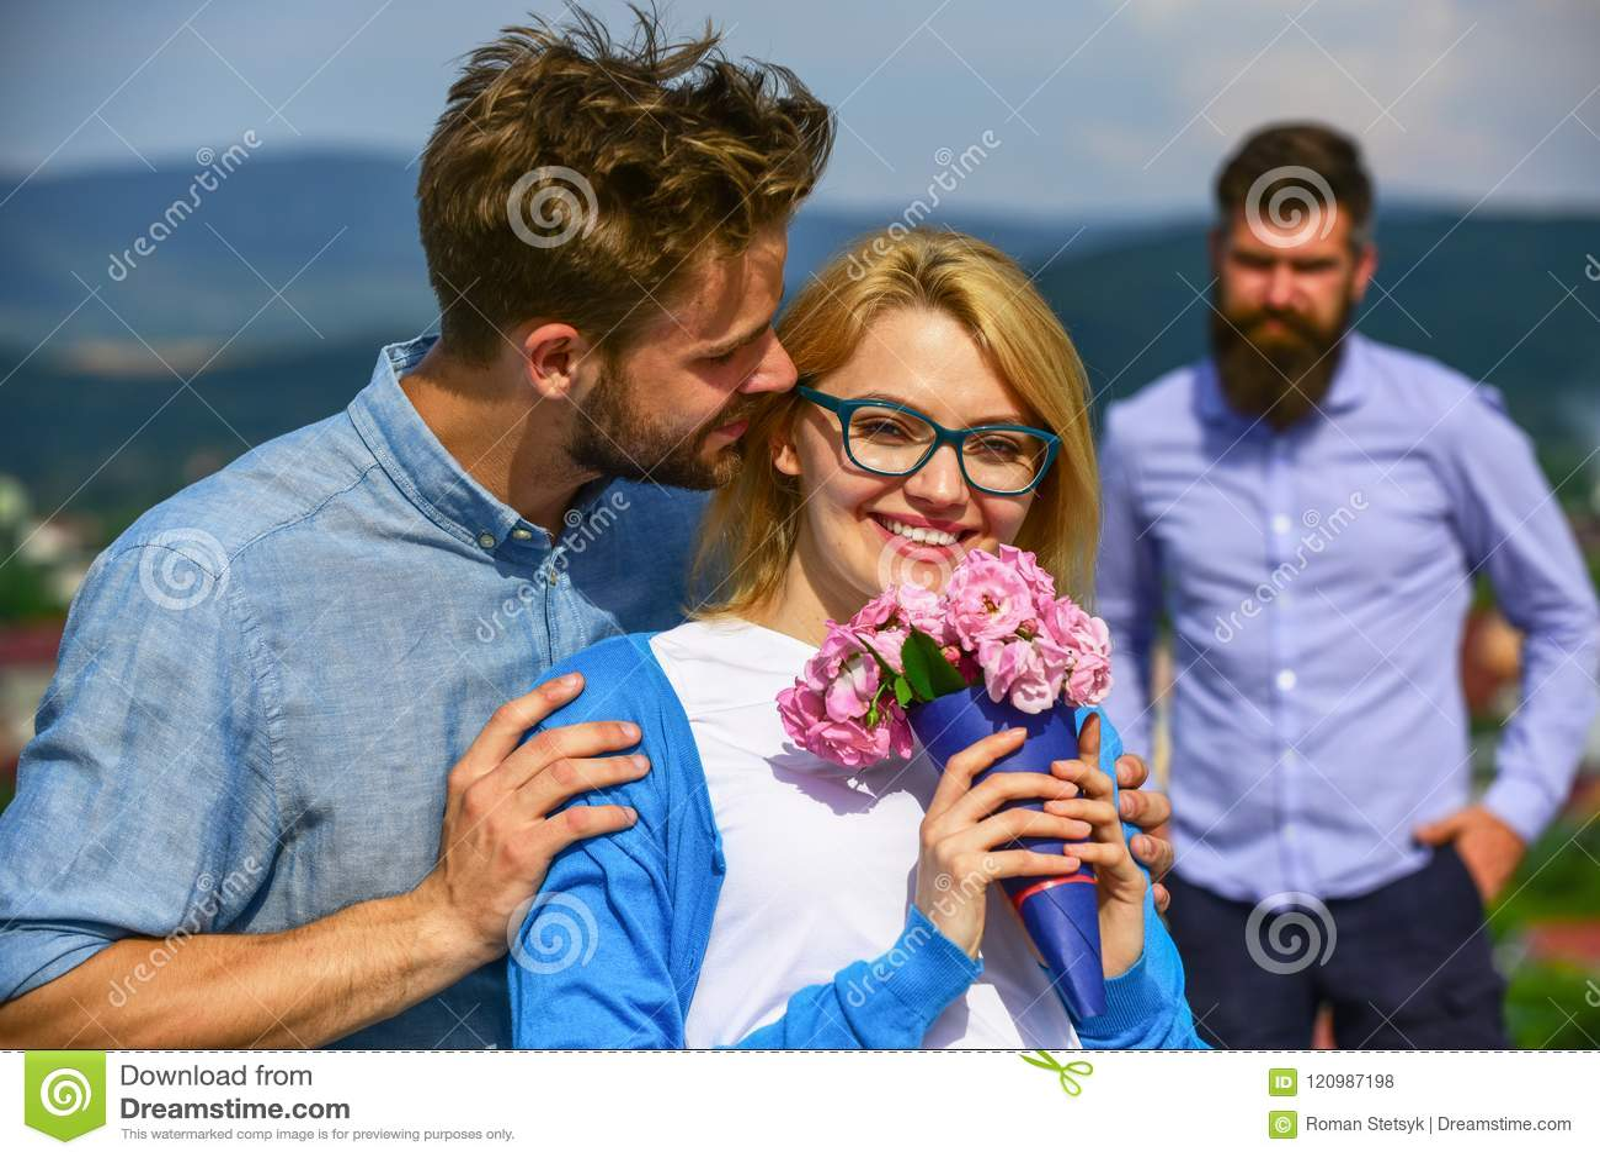 brad pitt dating reddit